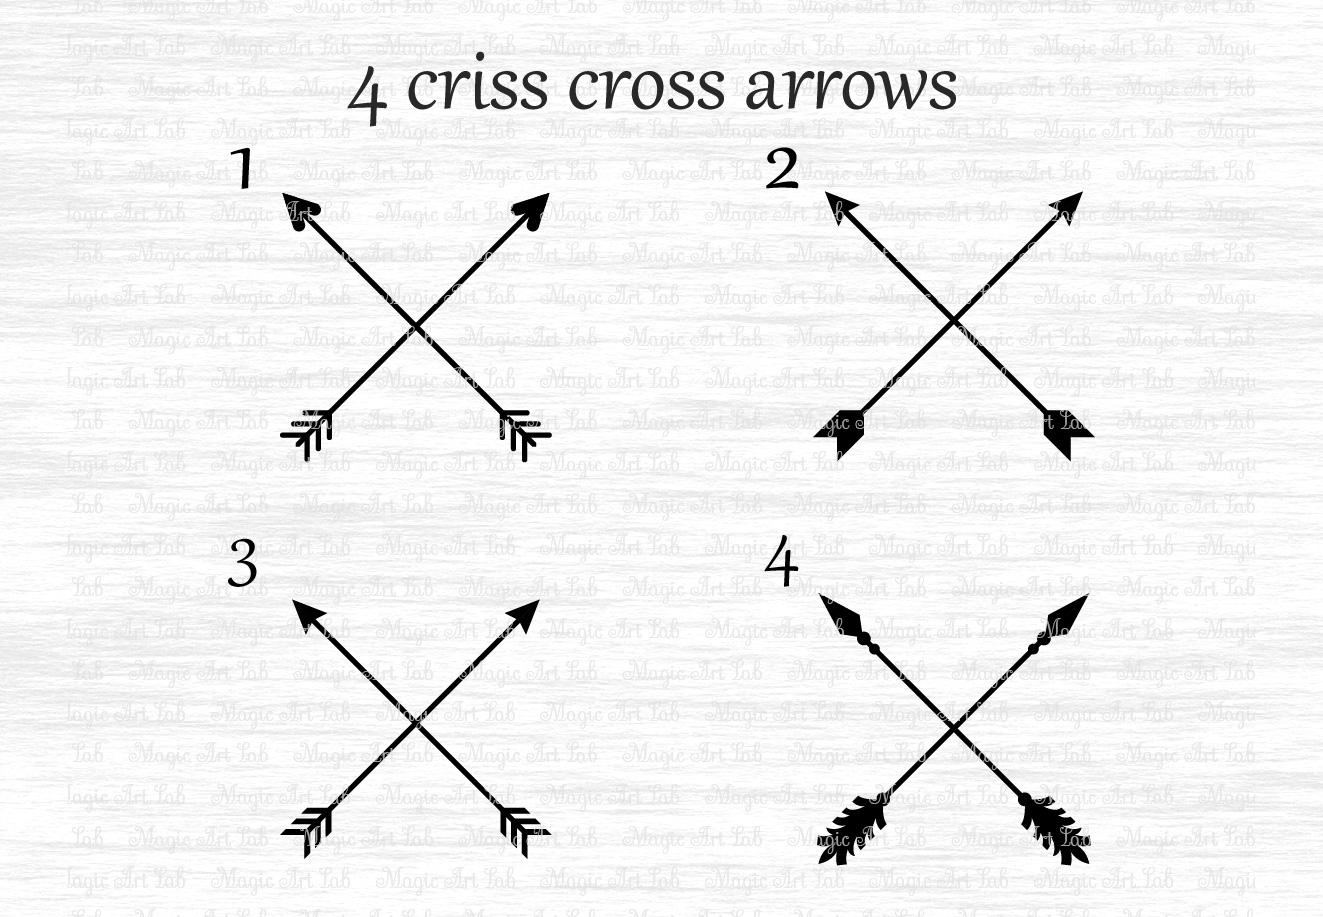 Arrows svg, Circle monogram svg, Circle frame arrow, Heart frame, Criss cross arrows, Tribal arrows svg, Boho arrows clipart, Ethnic aztec example image 3